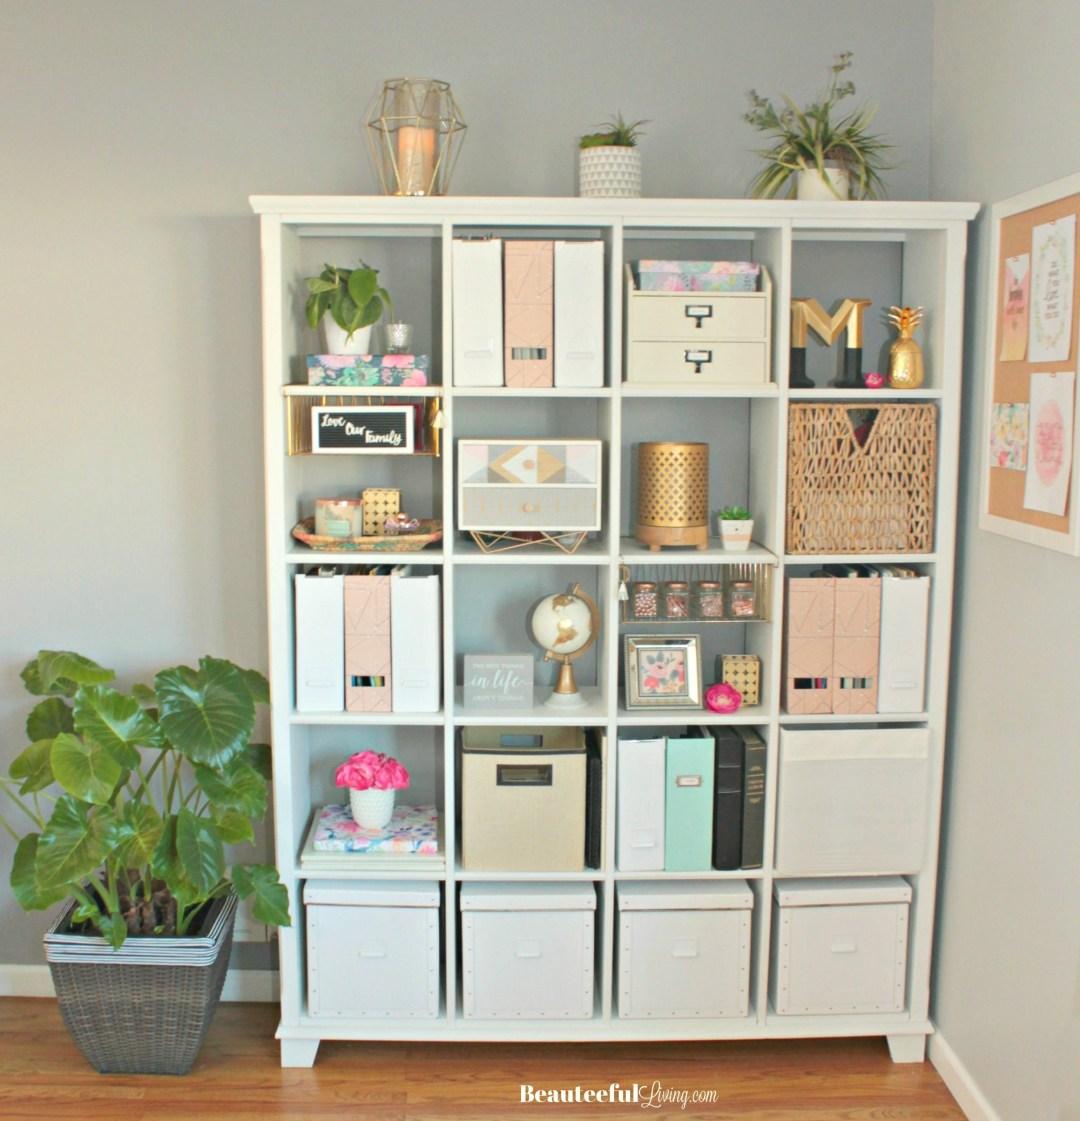 How to Repaint Book Shelf - Beauteeful Living